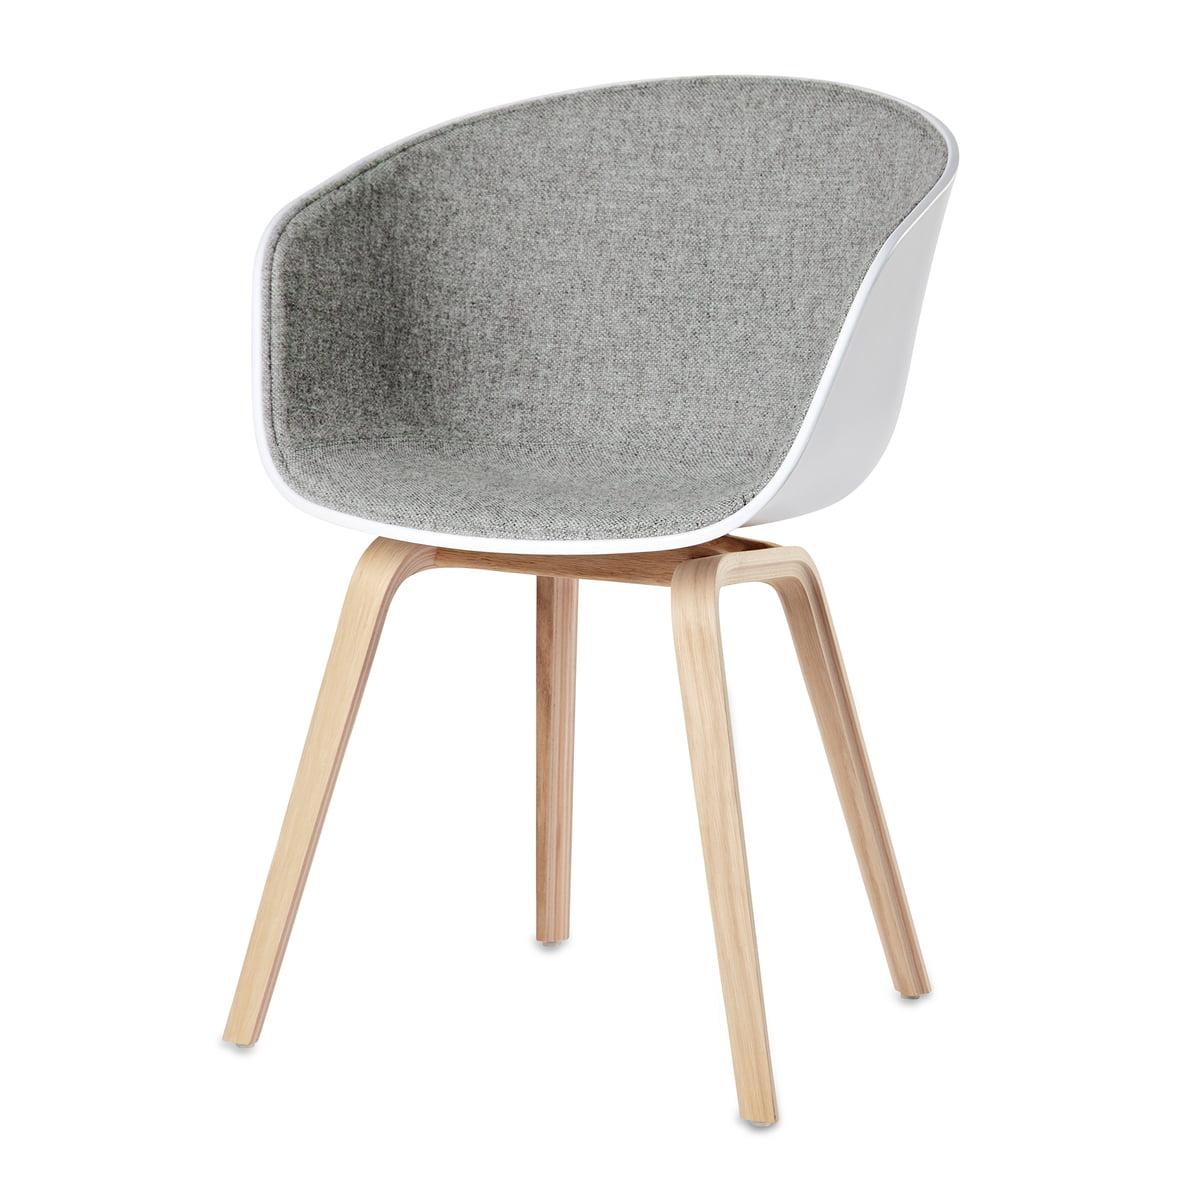 22Eiche Hay Aac 123 A GeseiftWeiß Hellgrauremix Chair About 9YWDH2IE